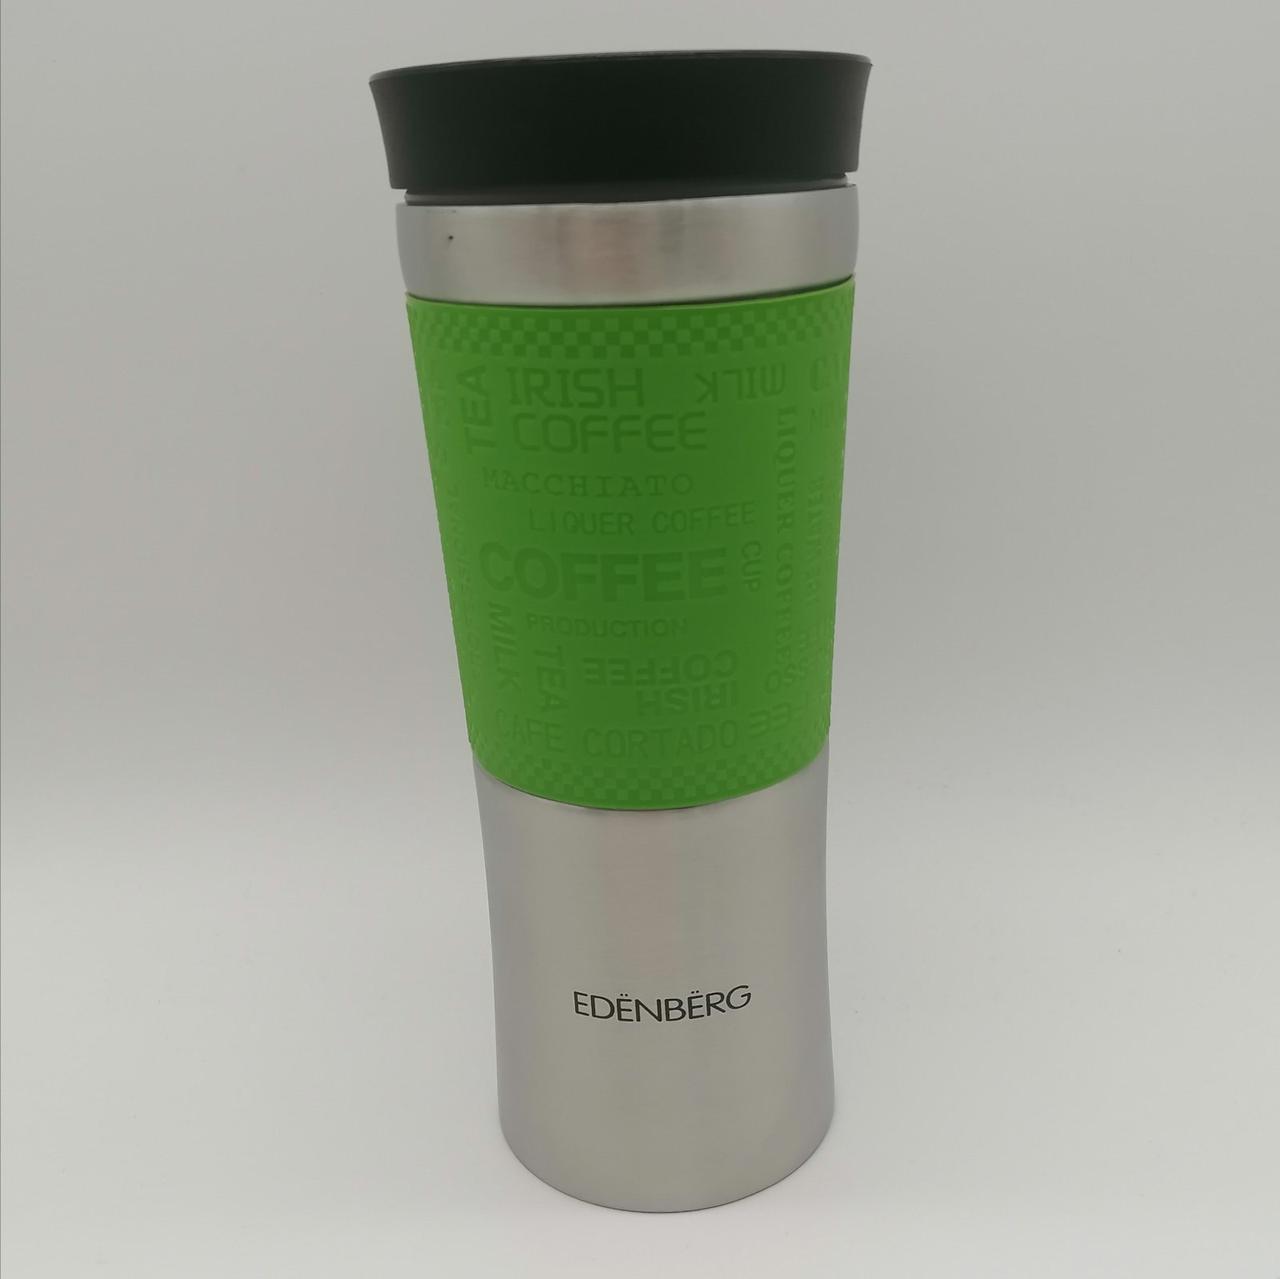 Термокружка Edenberg EB-633-3 кружка-термос 480 мл зелена